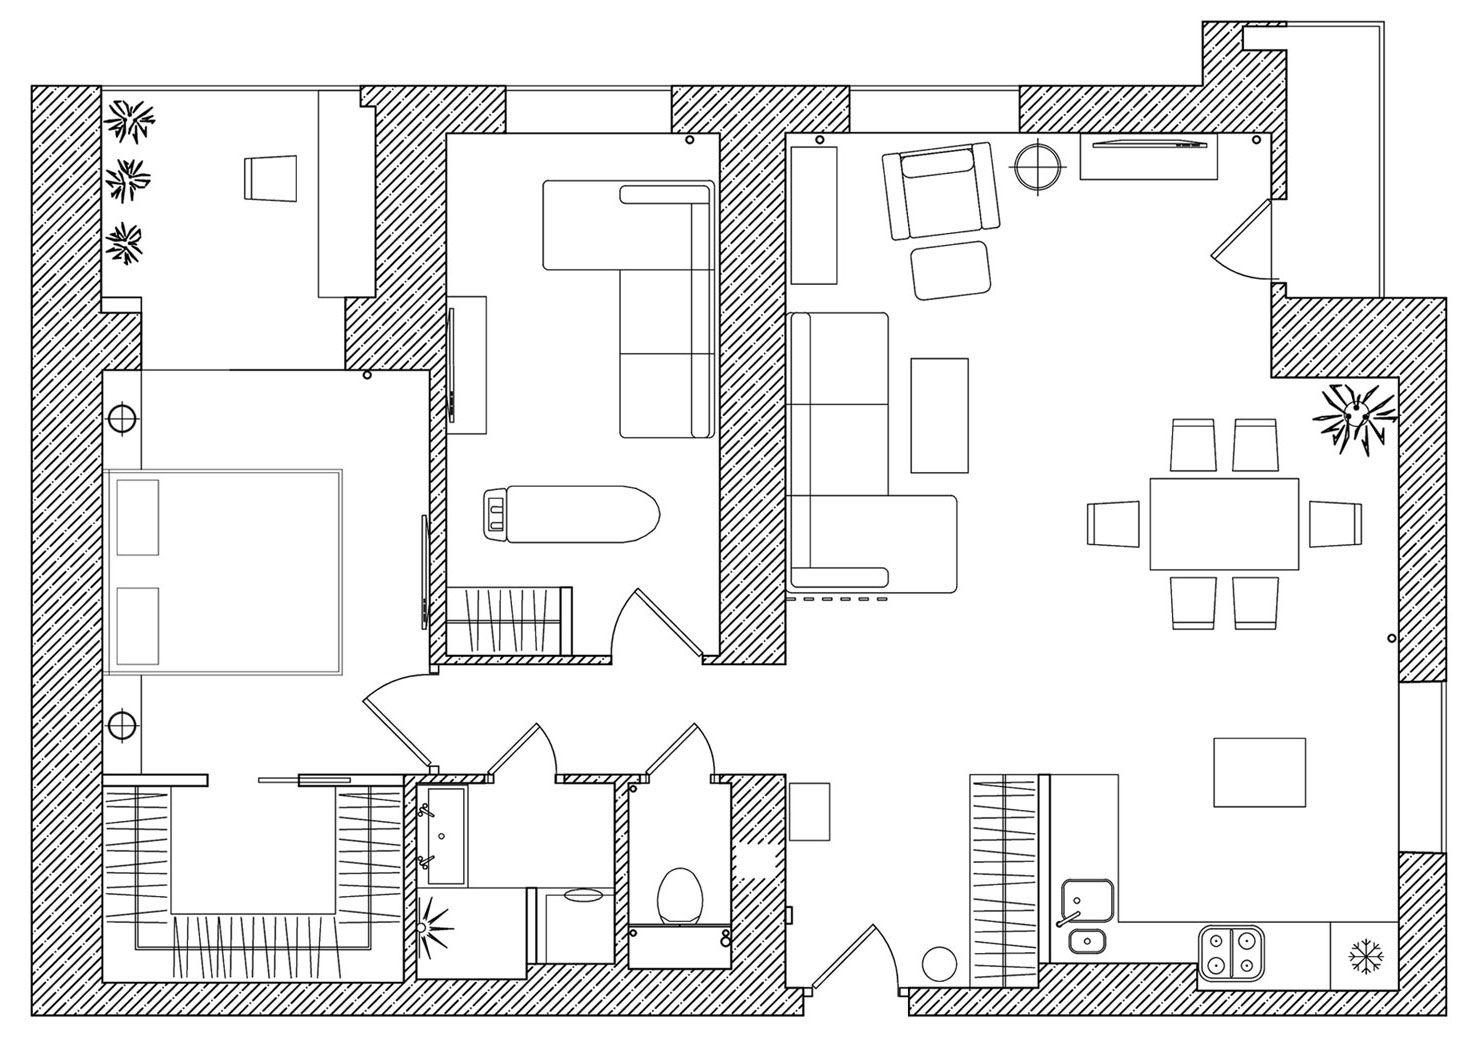 Bogatyrskiy-Modern-Apartment-10